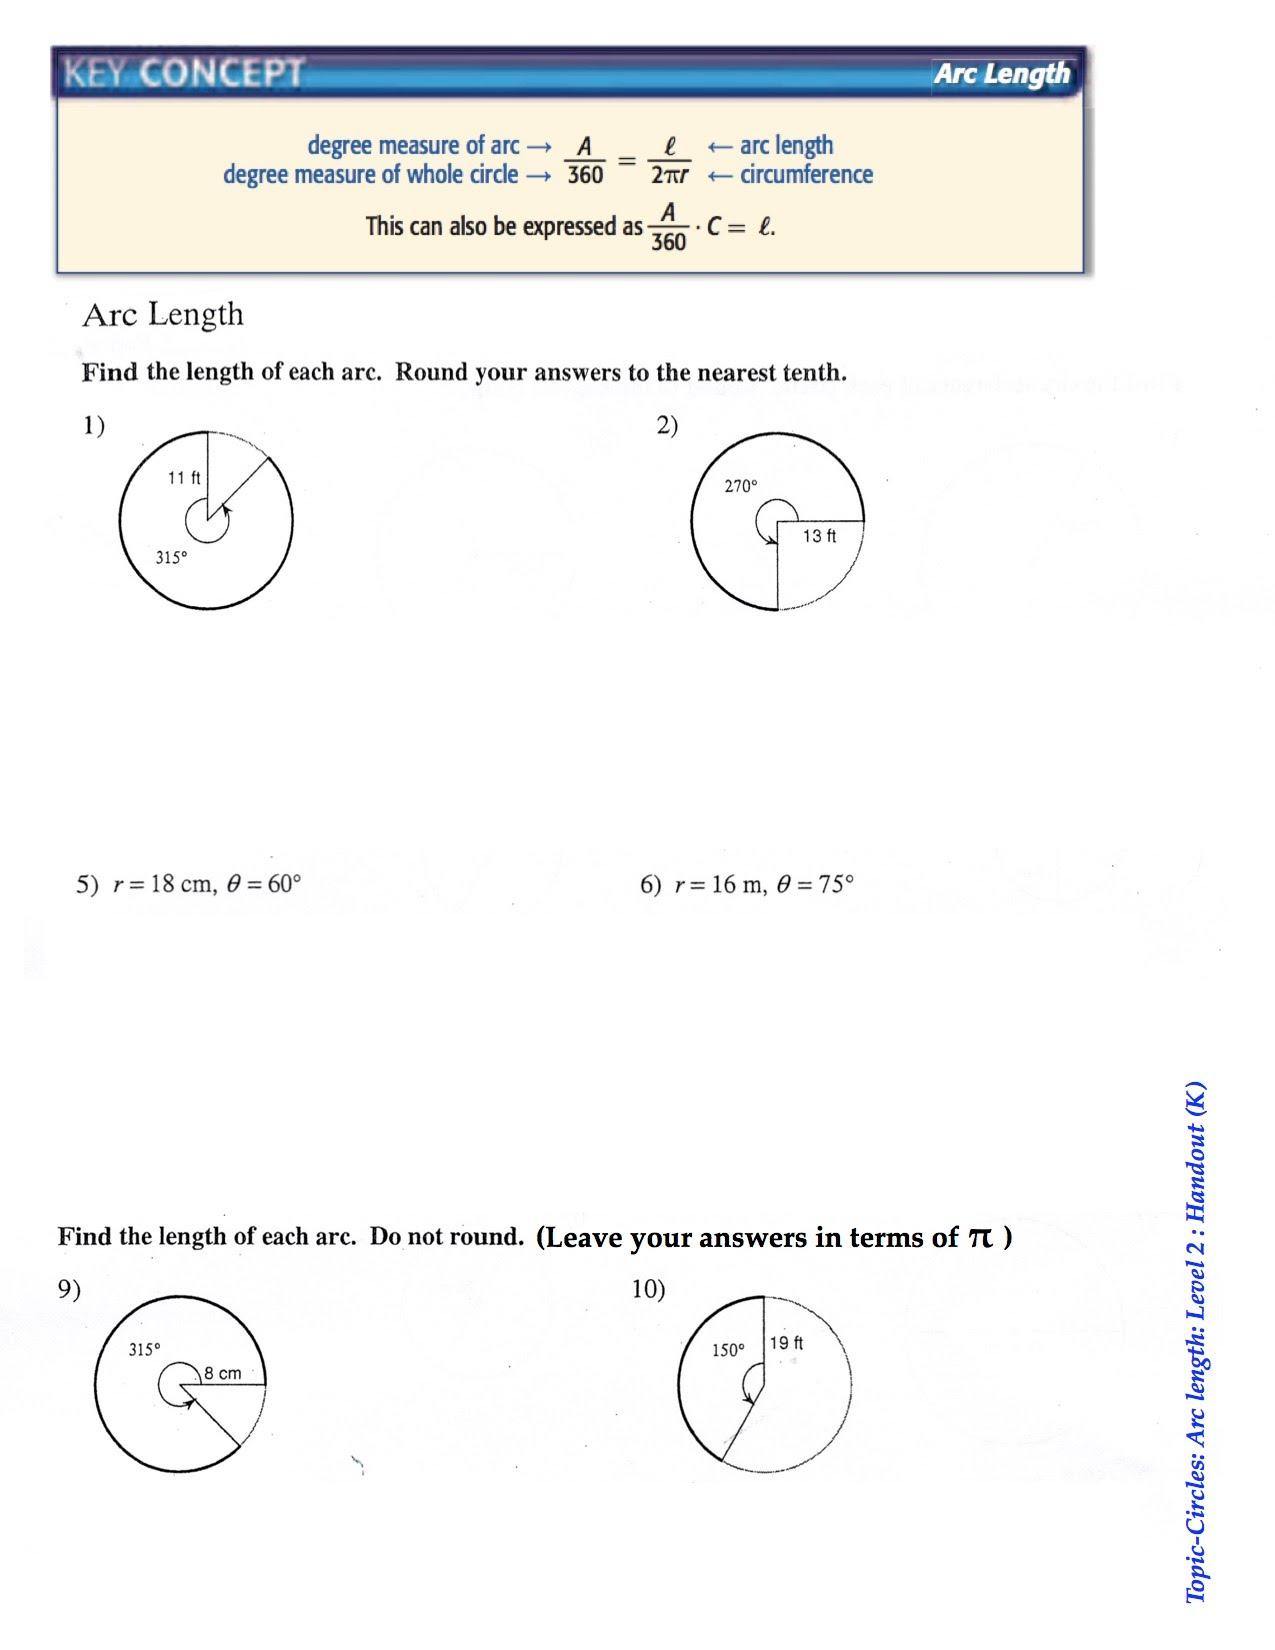 worksheet Arc Length And Sector Area Worksheet Answers worksheet arc length and sector area thedanks handout k rsu 2 math 10 geometry